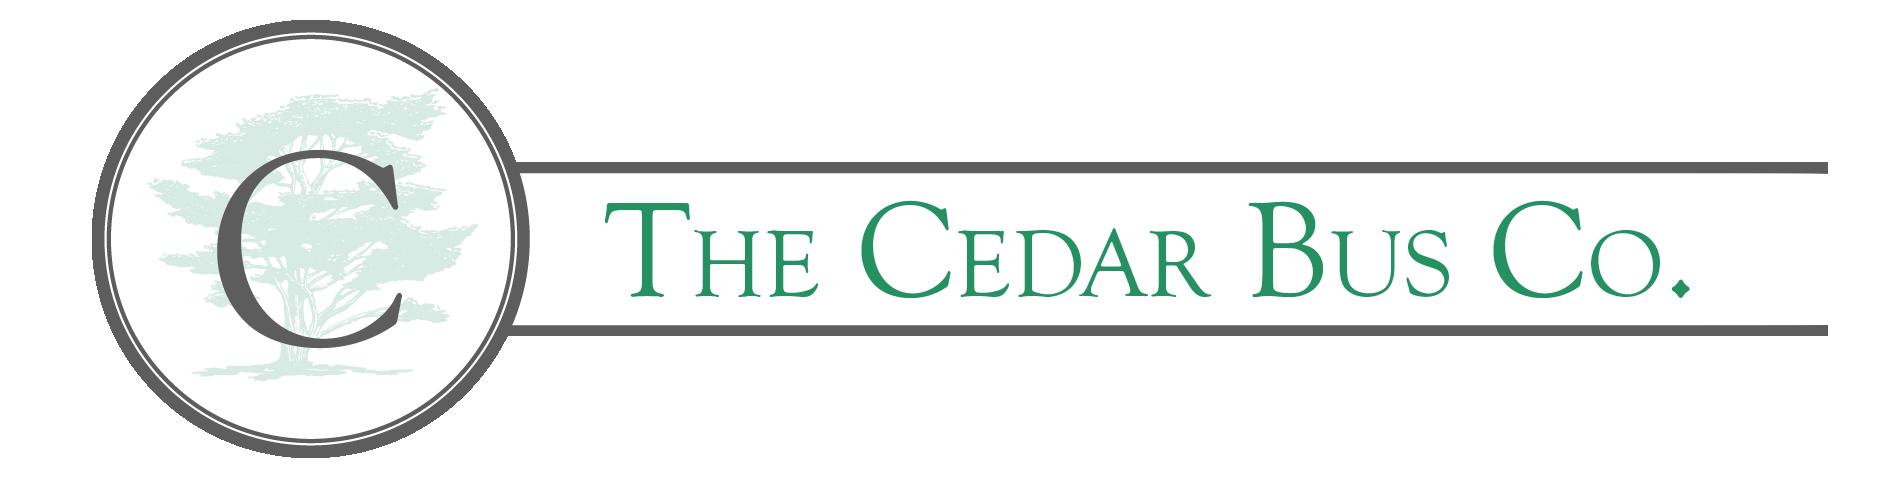 Cedar Bus Company